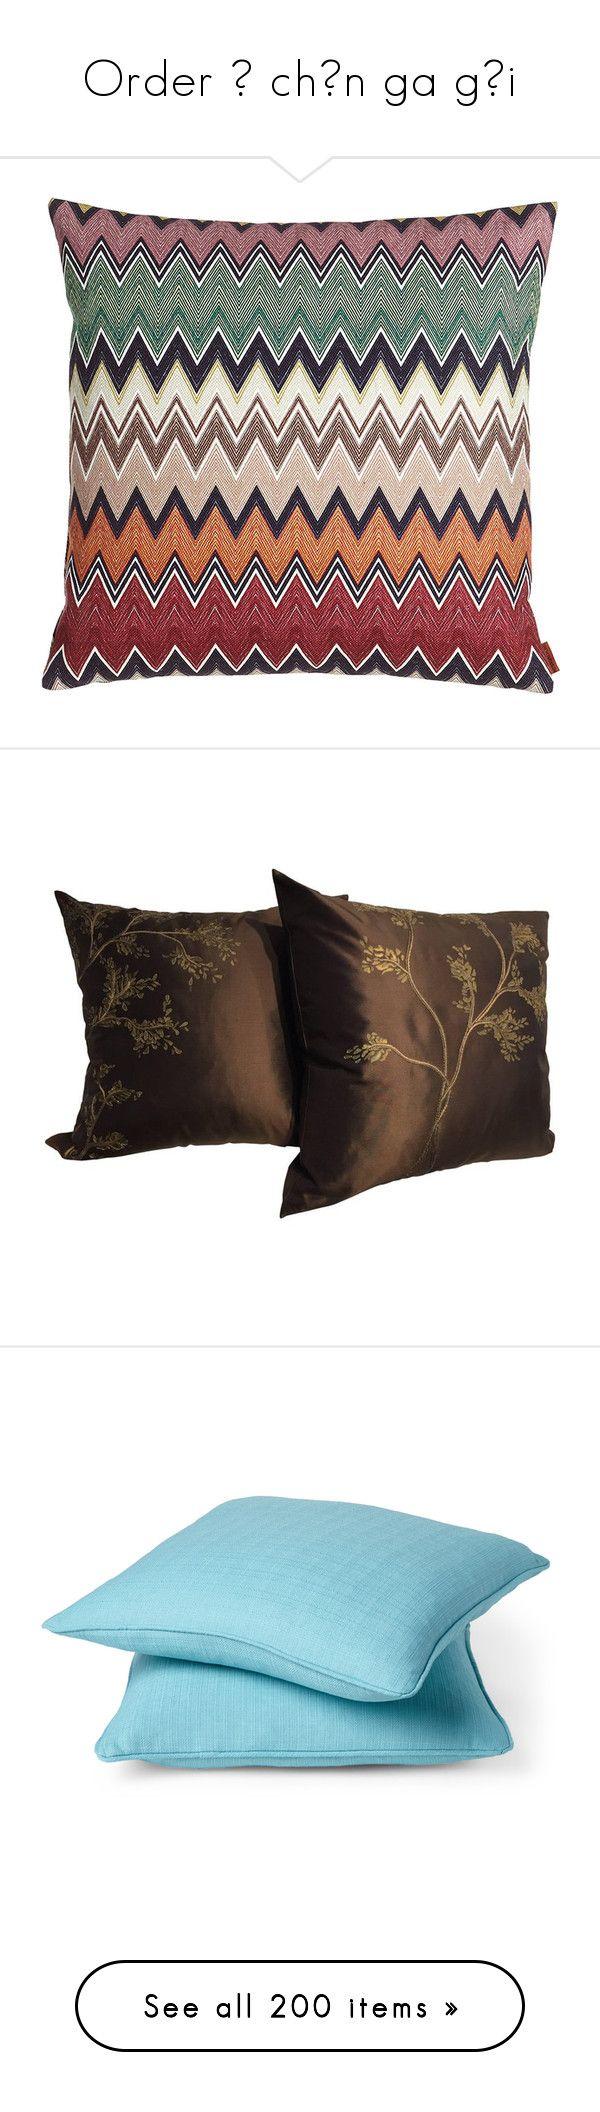 Shop home decor chevron stripes pillow from shop home decor -  Home Decor Throw Pillows Home Decor Pillows Multi Pattern Patterned Throw Pillows Chevron Home Decor Missoni Home Chevron Throw